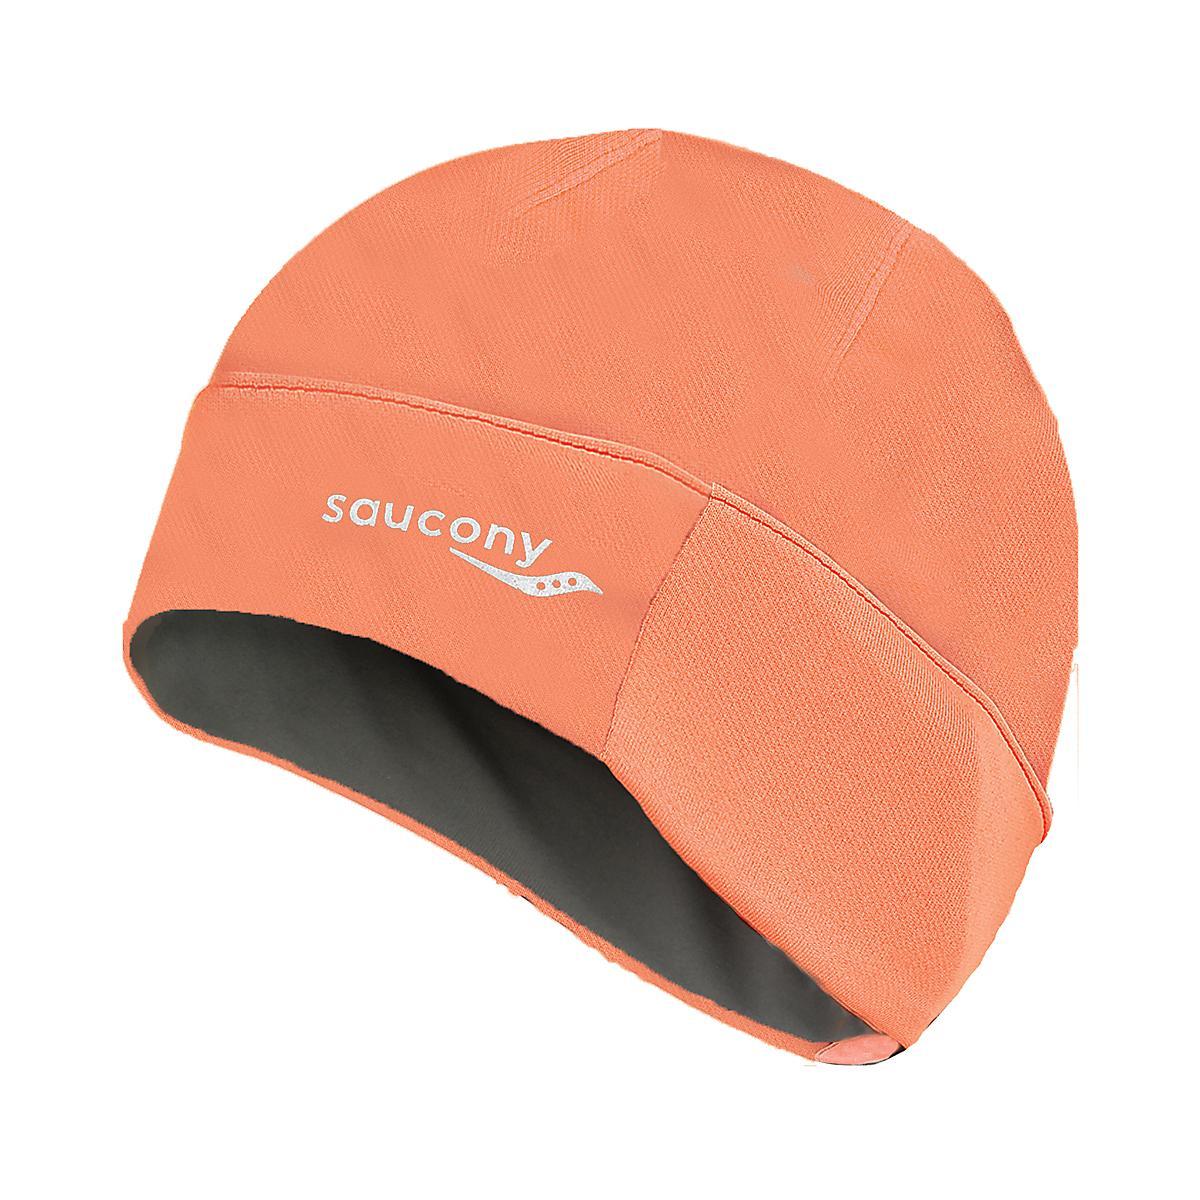 efc76440 Saucony Drylete Skull Cap Headwear at Road Runner Sports